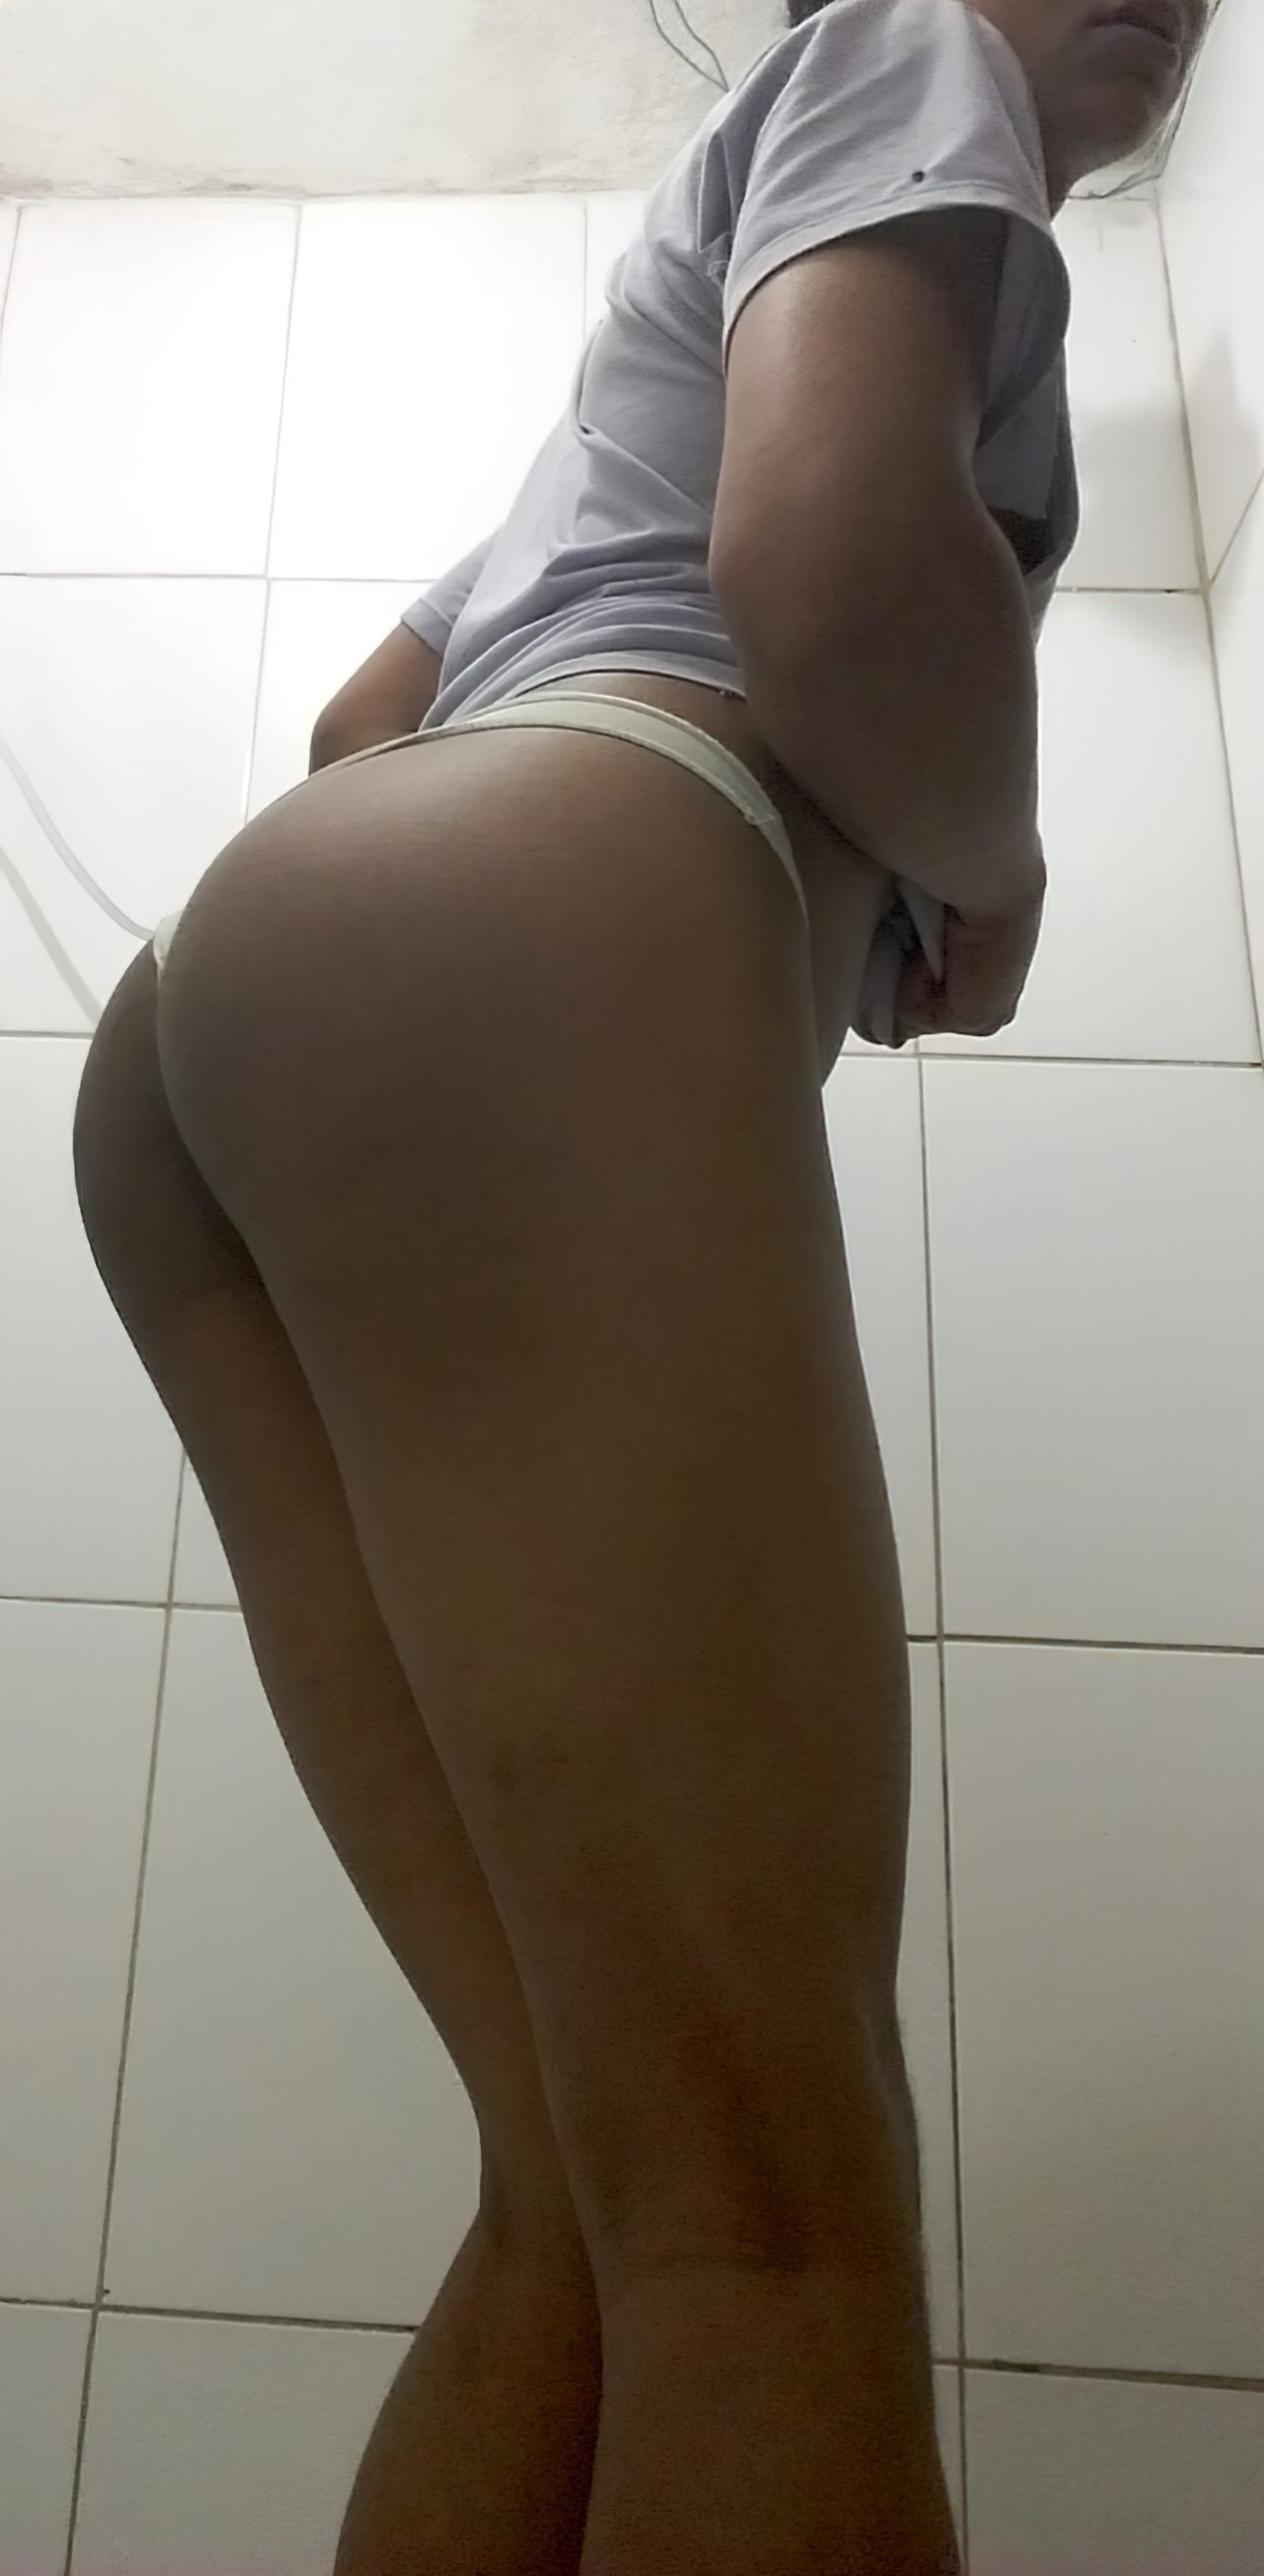 Amadora Safadinha (8)